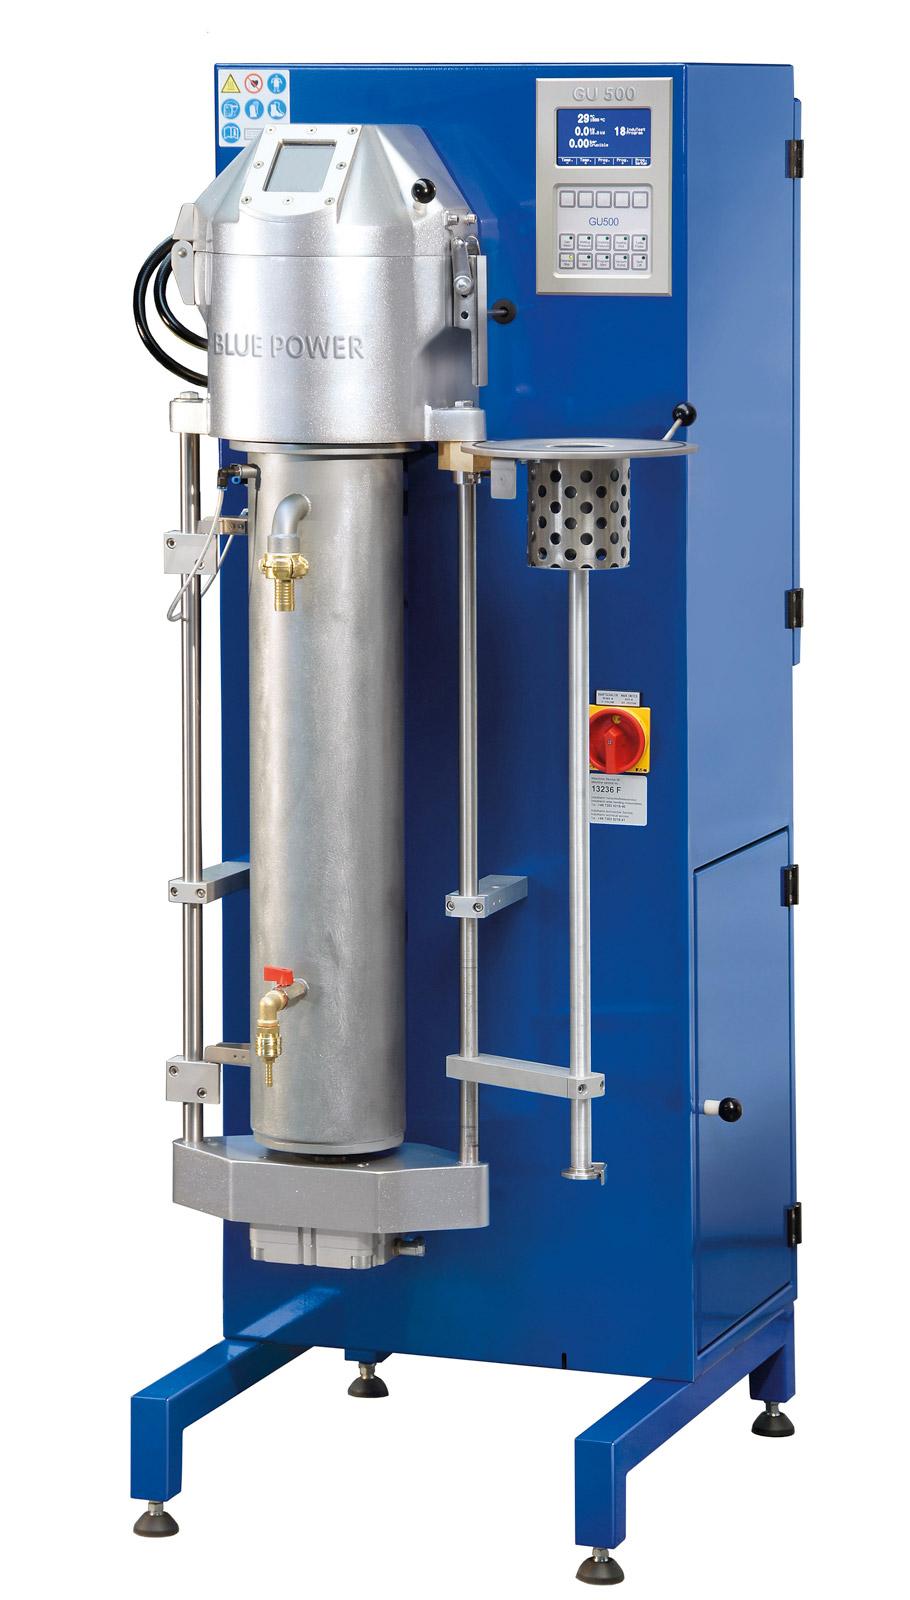 Granulieranlage GU 500 / Granulating Unit GU 500